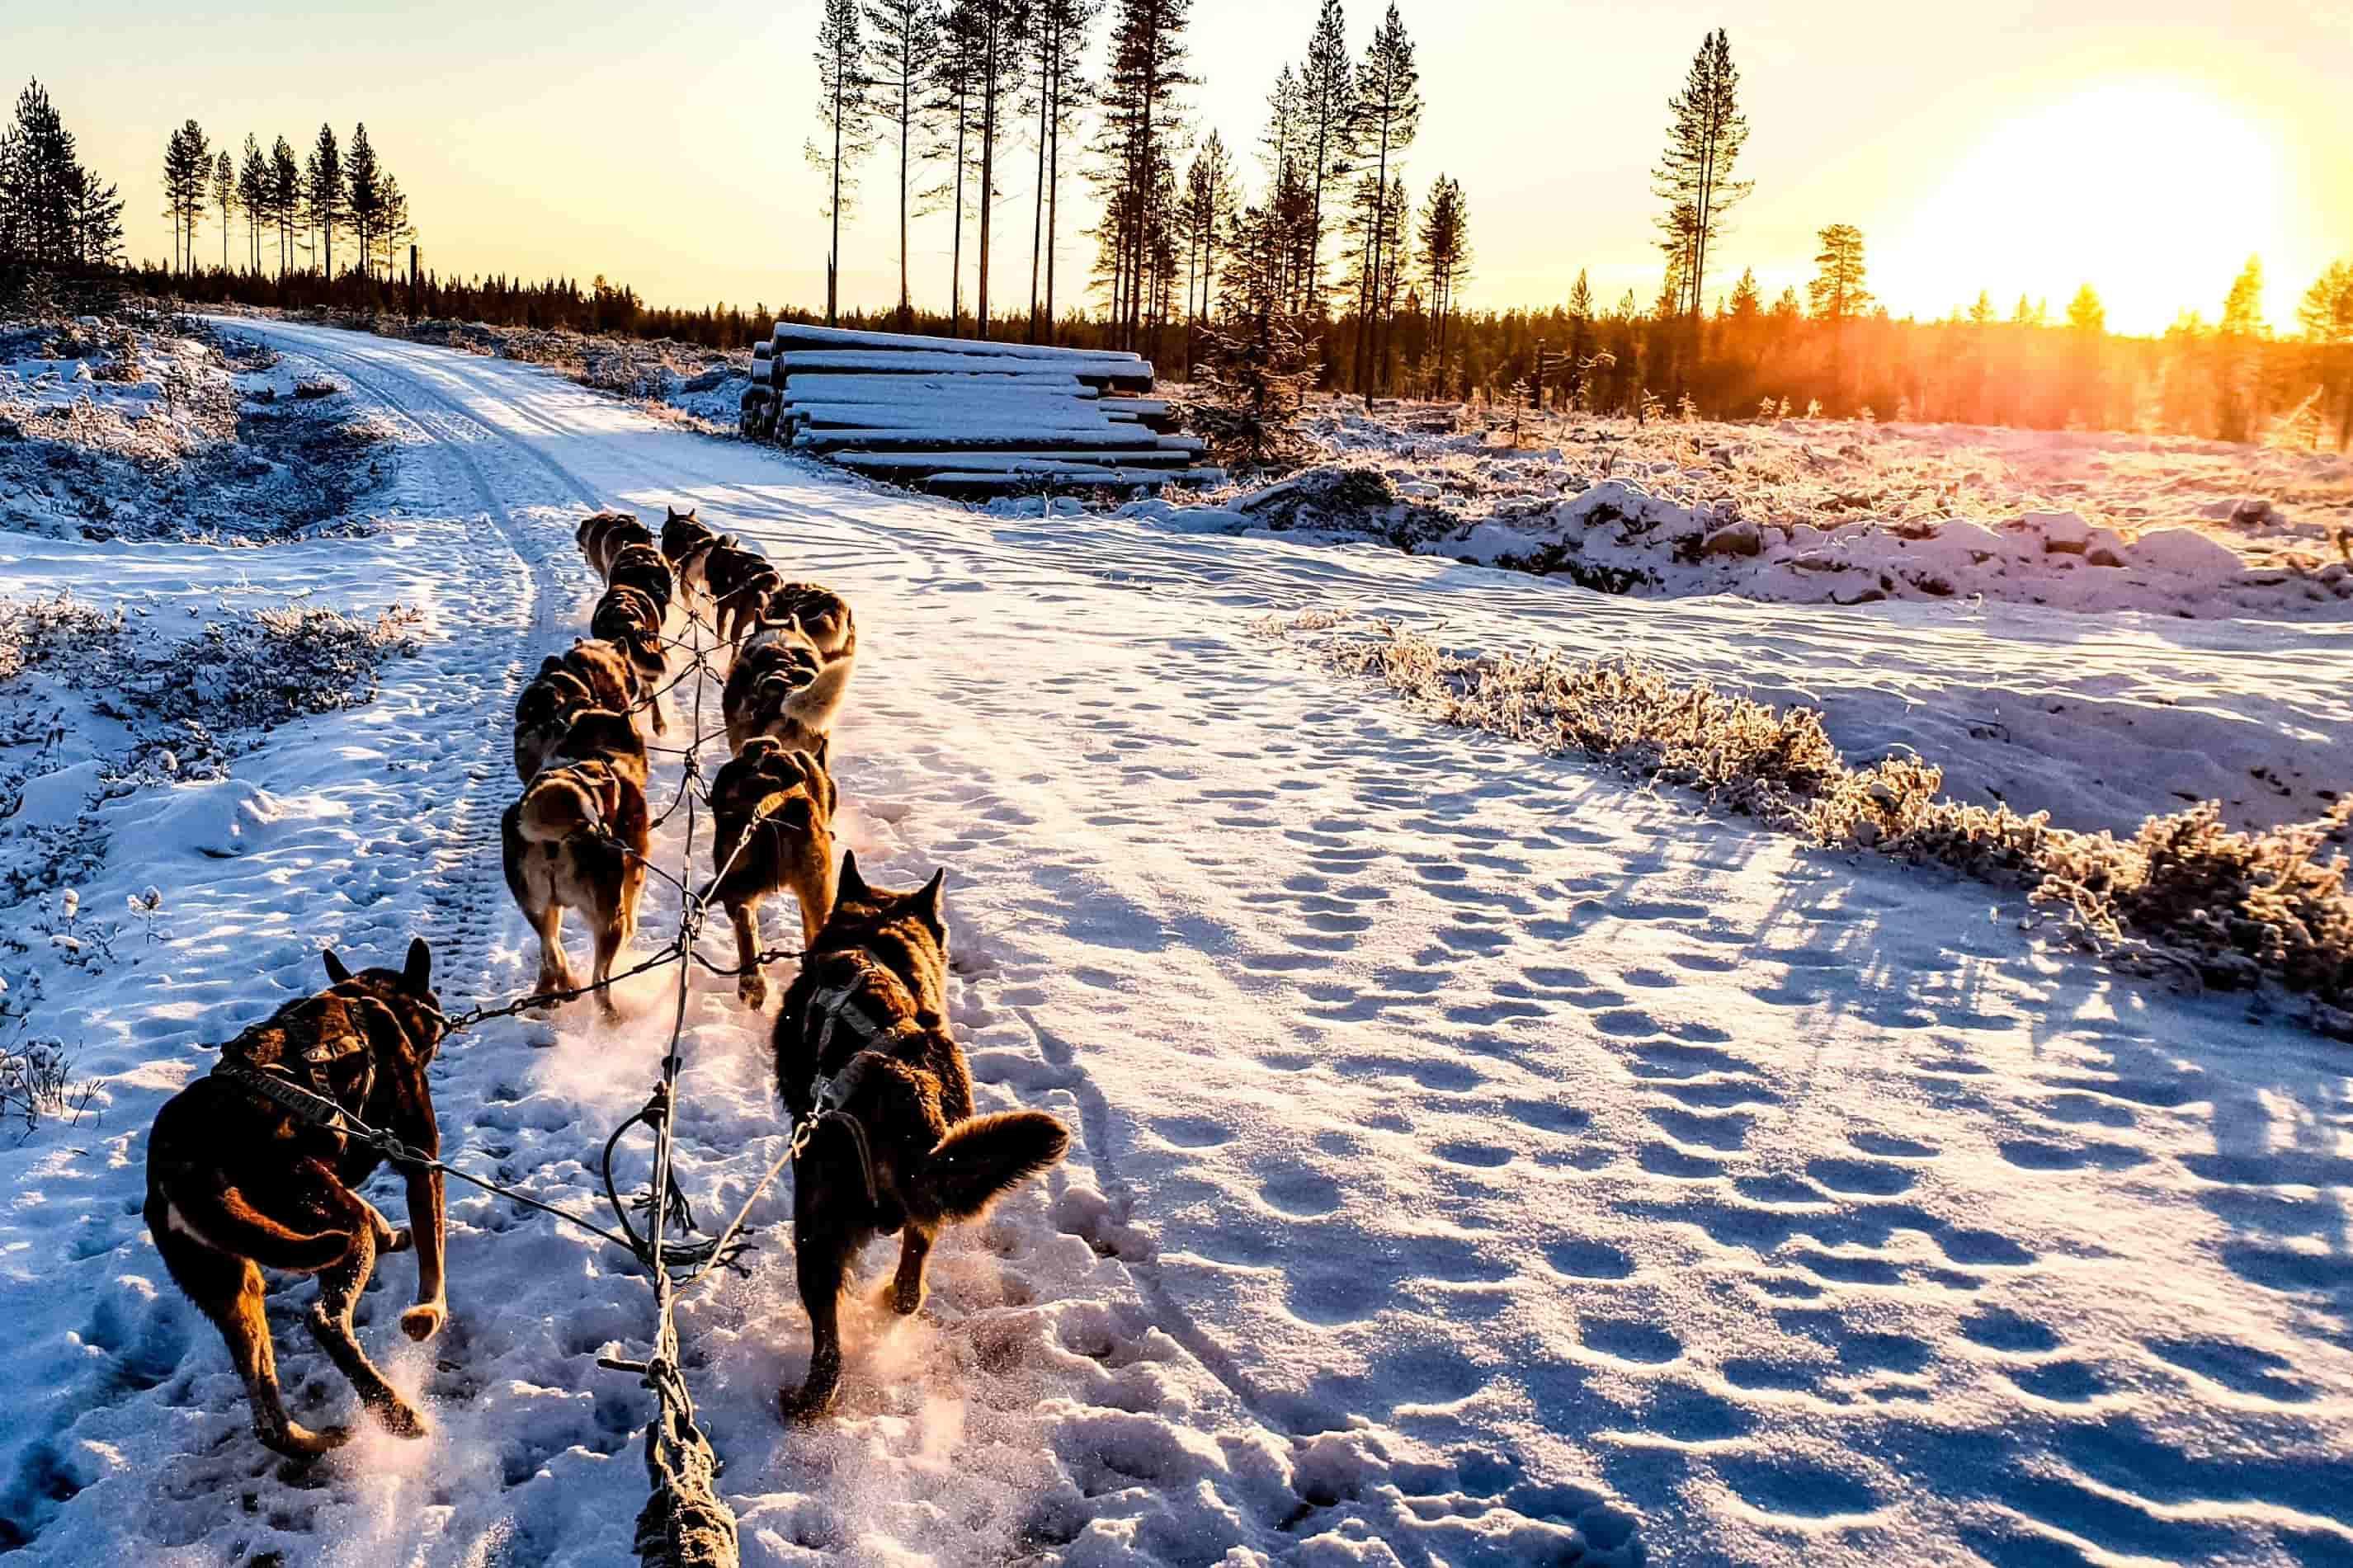 Ruka. En familia a Laponia.NUBA everywhere. Trineo perros